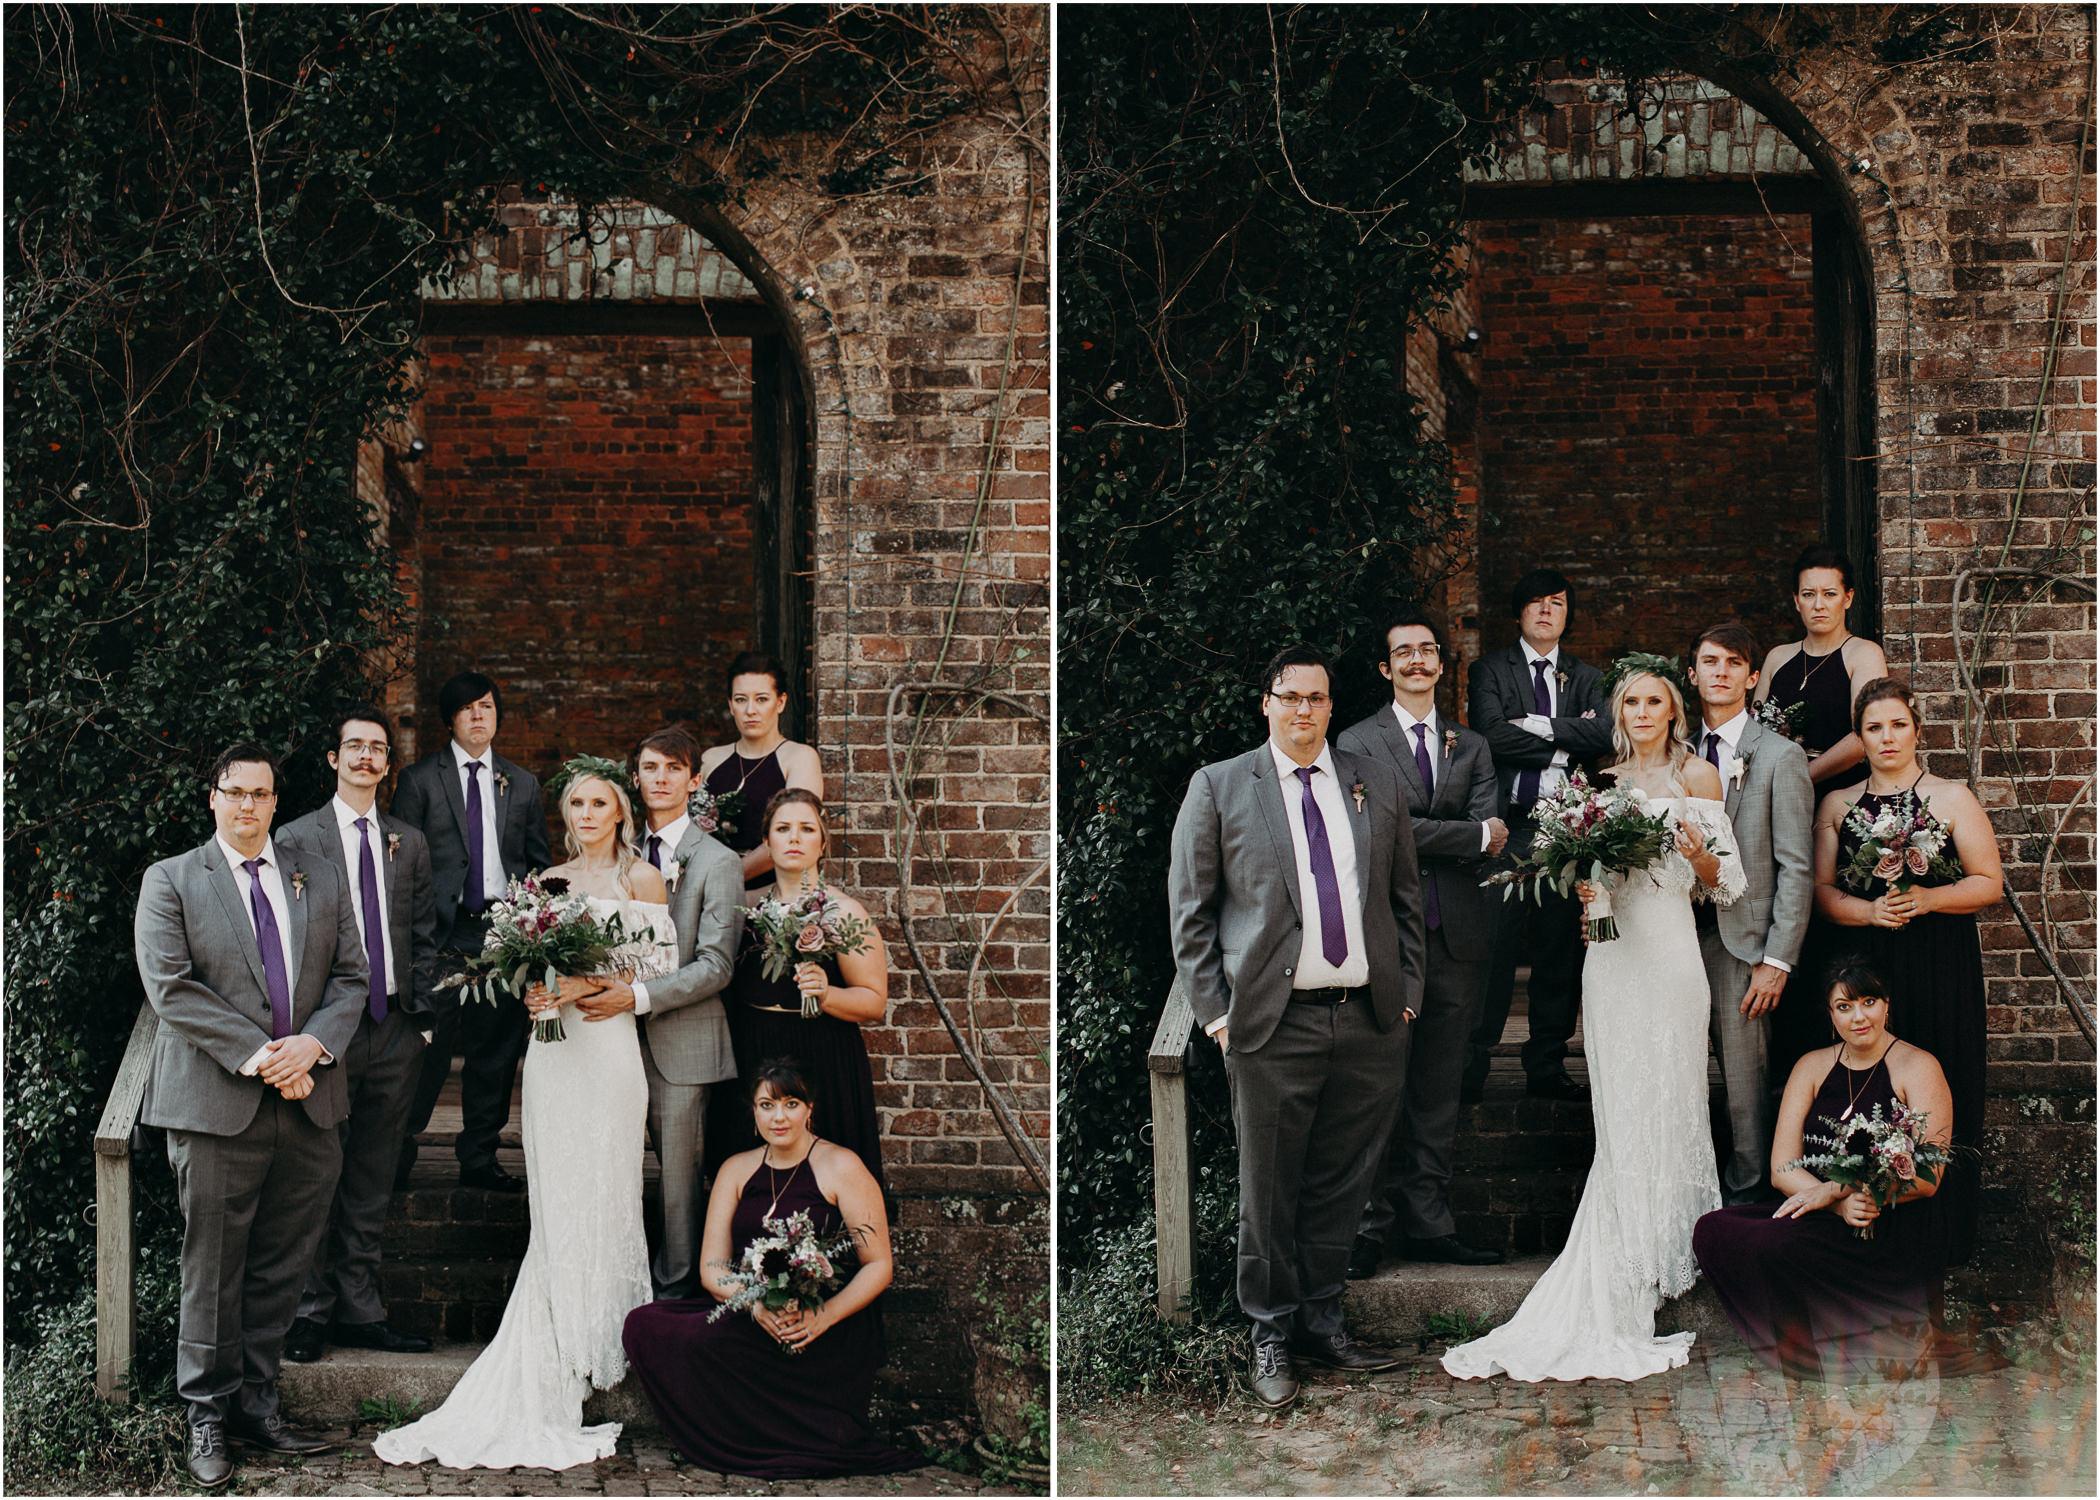 43 - Barnsley Gardens Wedding - Wedding Party portraits - First Look .jpg